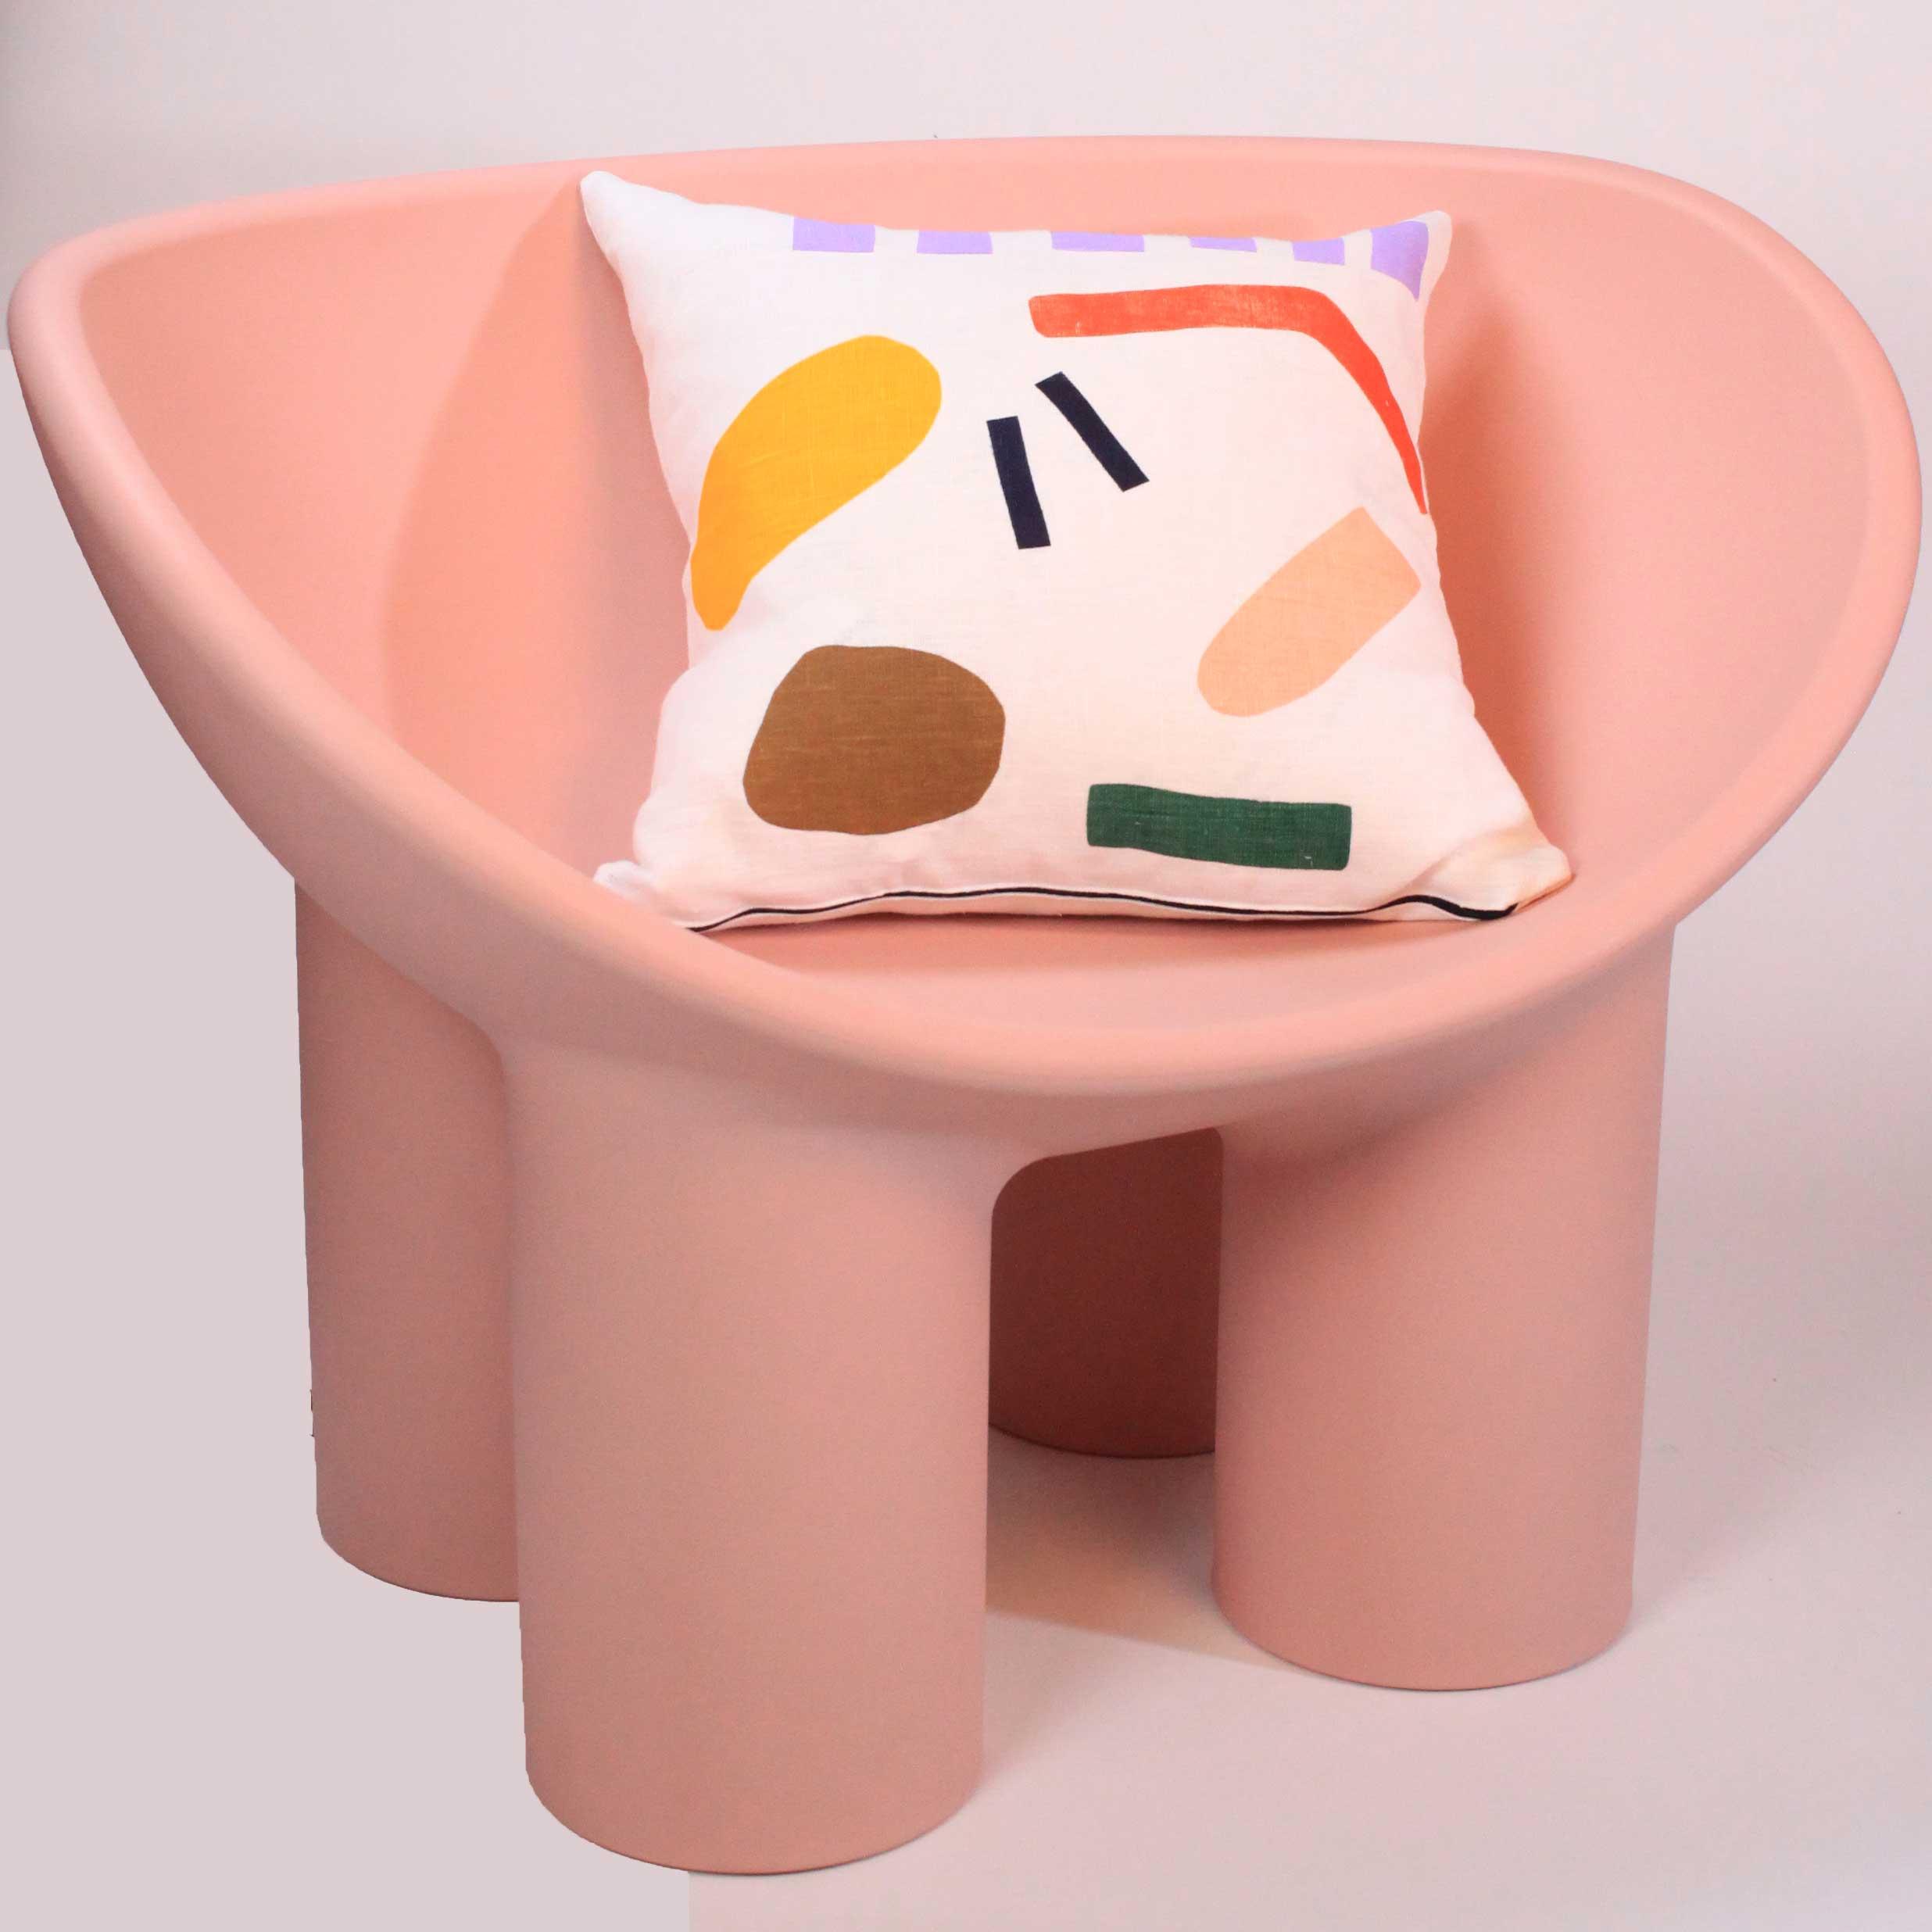 KJP artwork gallery textile cushion rug Cool Machine store